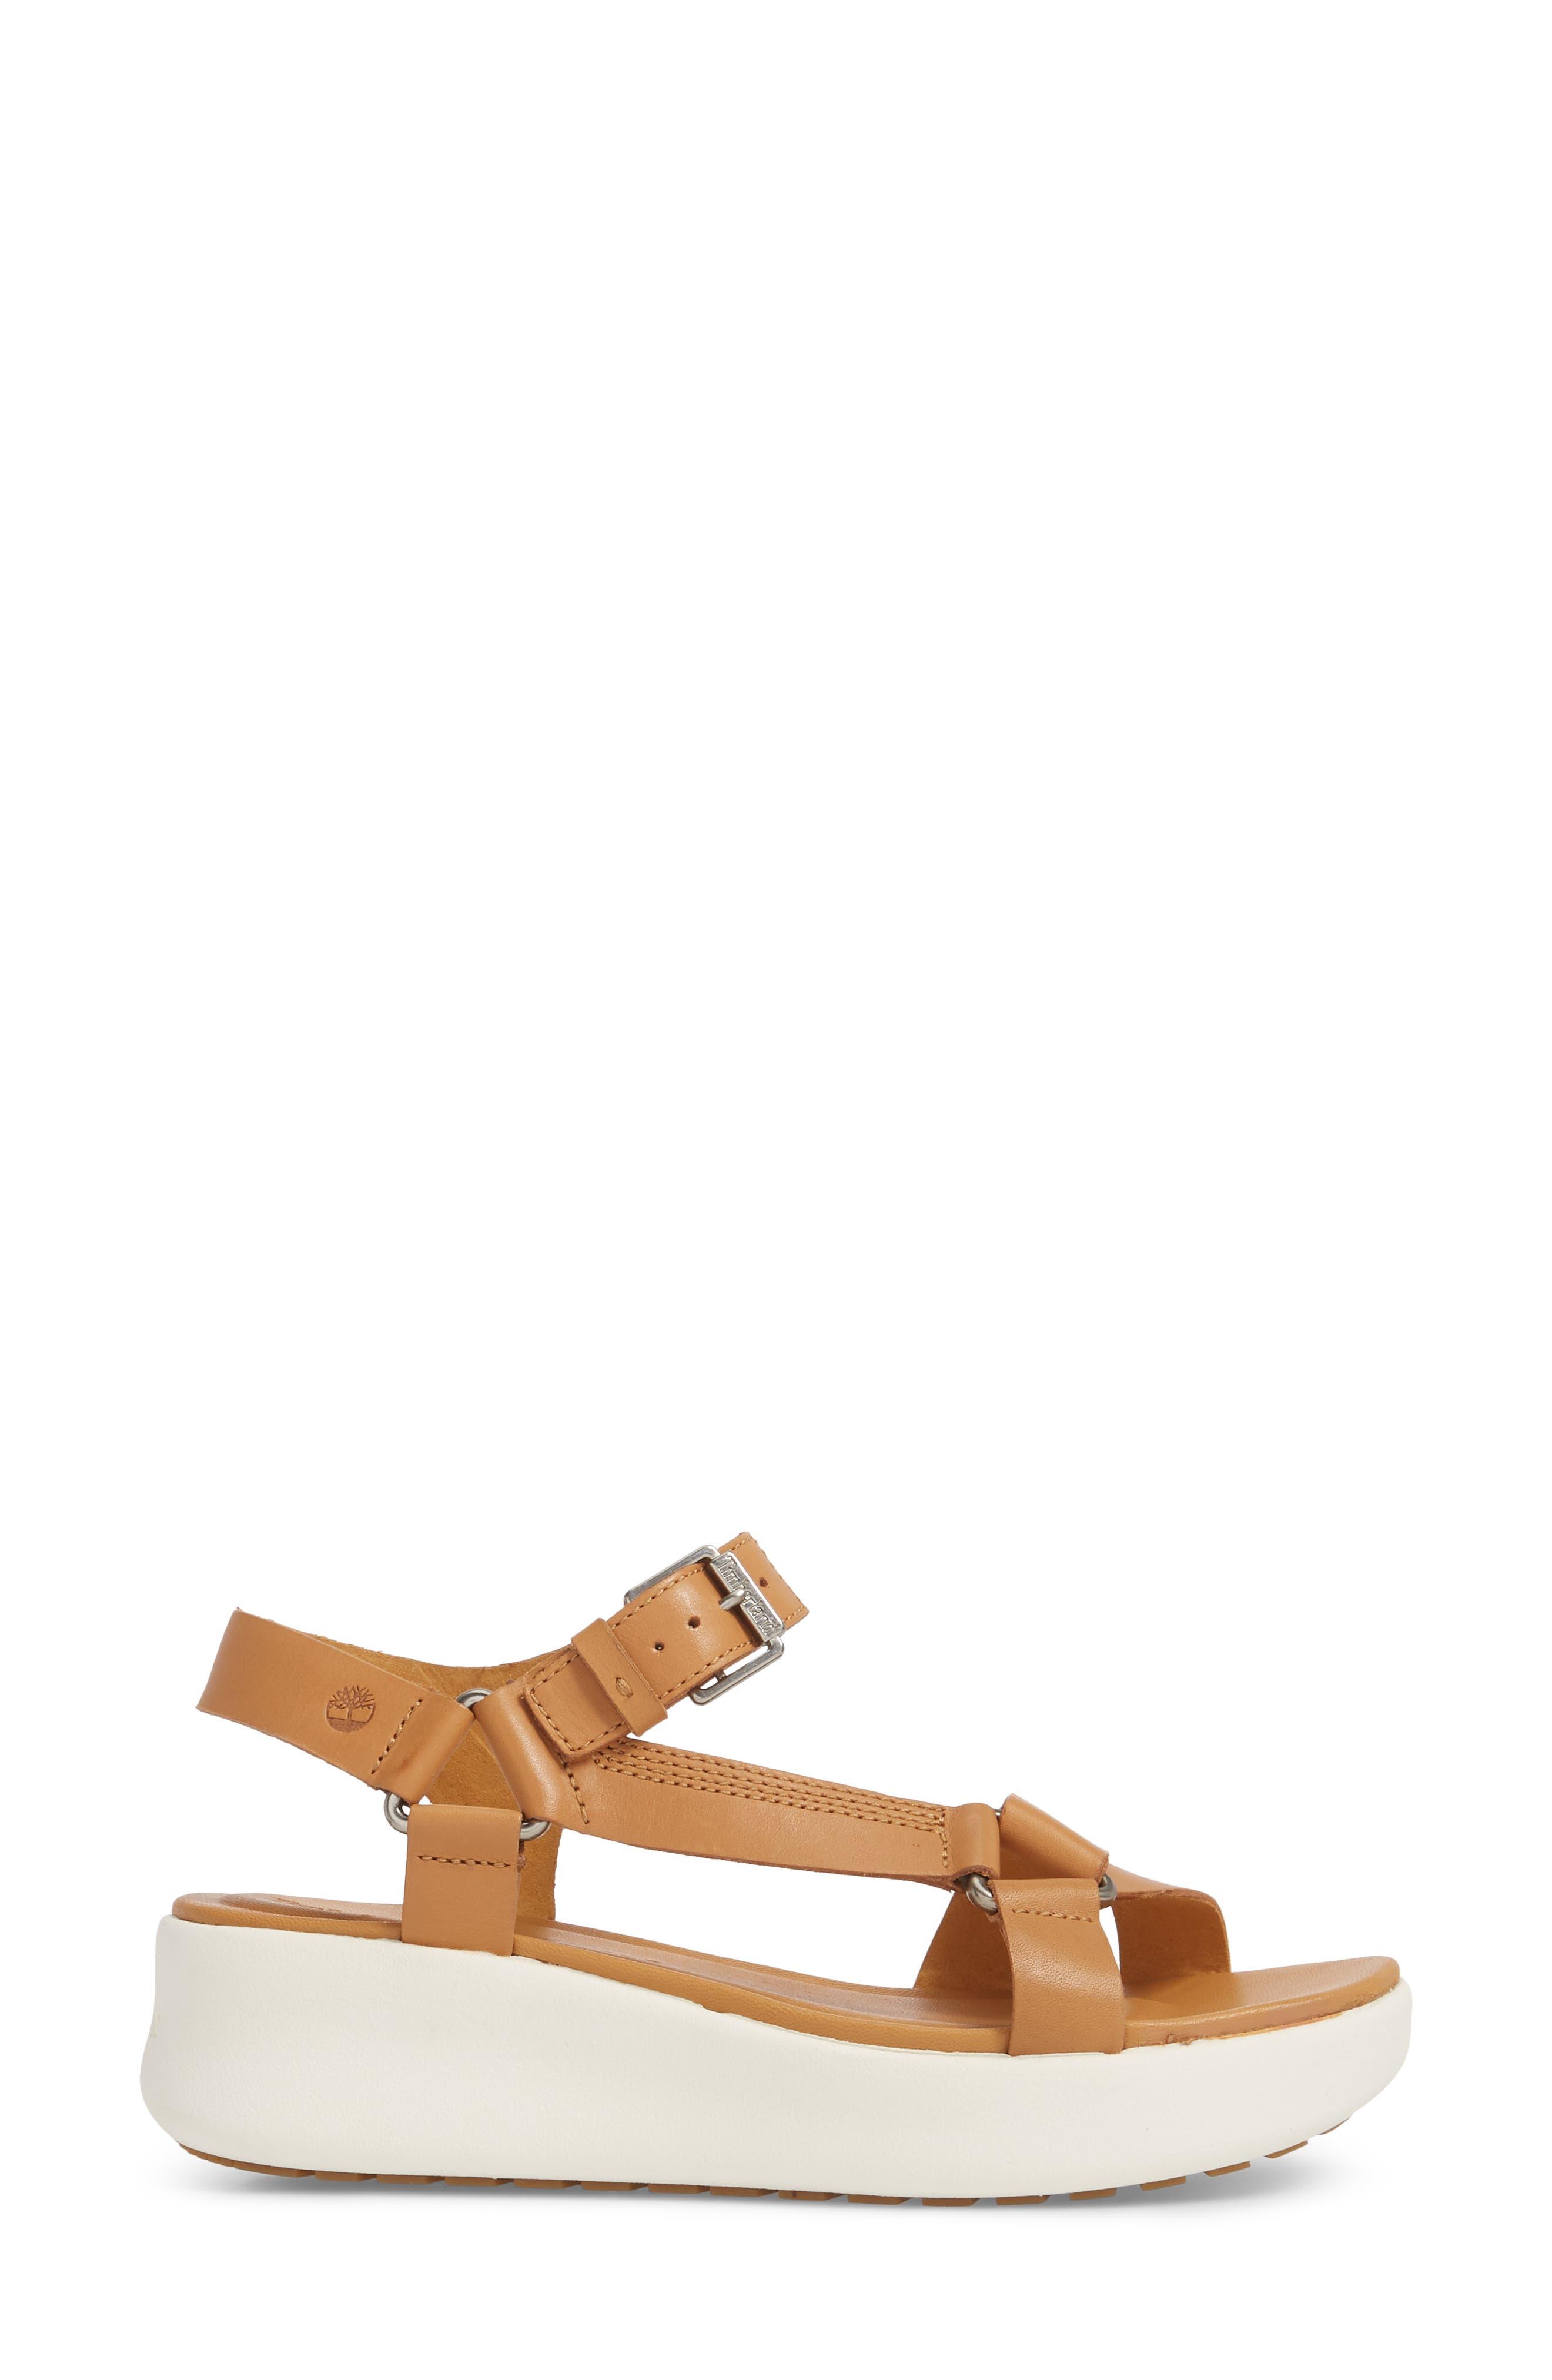 Los Angeles Wind Sport Sandal,                             Alternate thumbnail 3, color,                             Medium Brown Leather